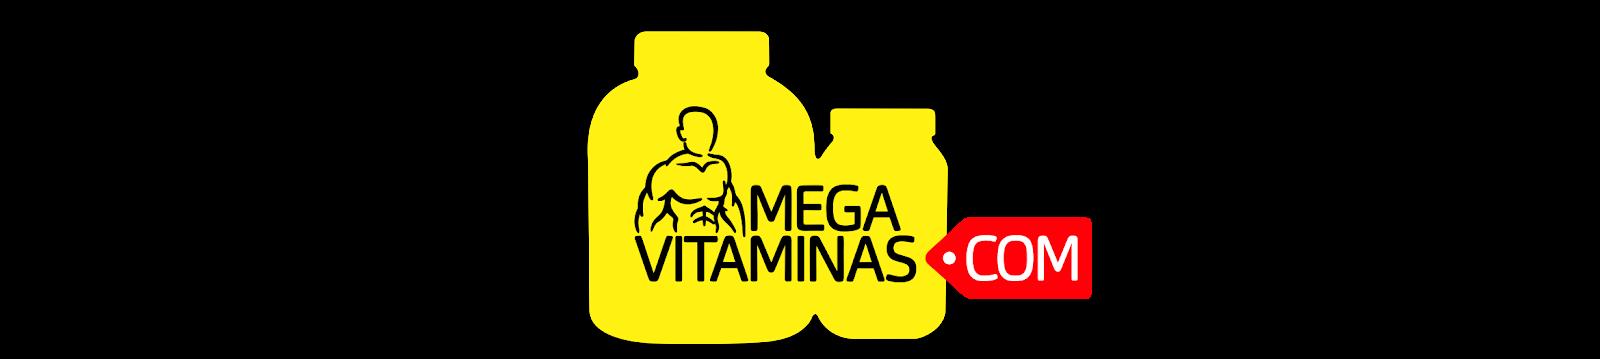 MEGA VITAMINAS NEWS